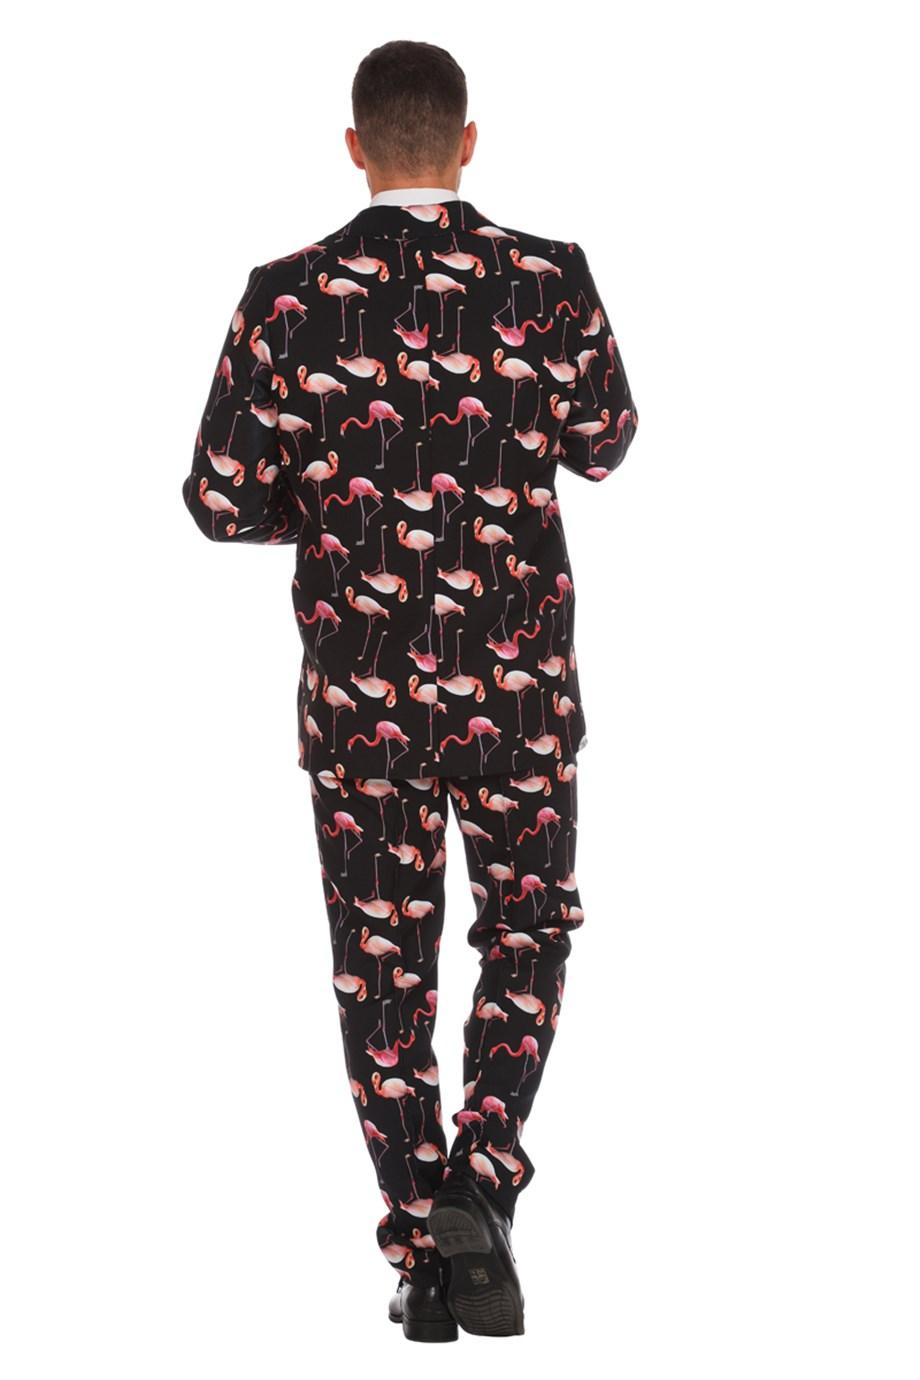 Herren Anzug Flamingo Muster Mit Krawatte Sakko Jackett Hose